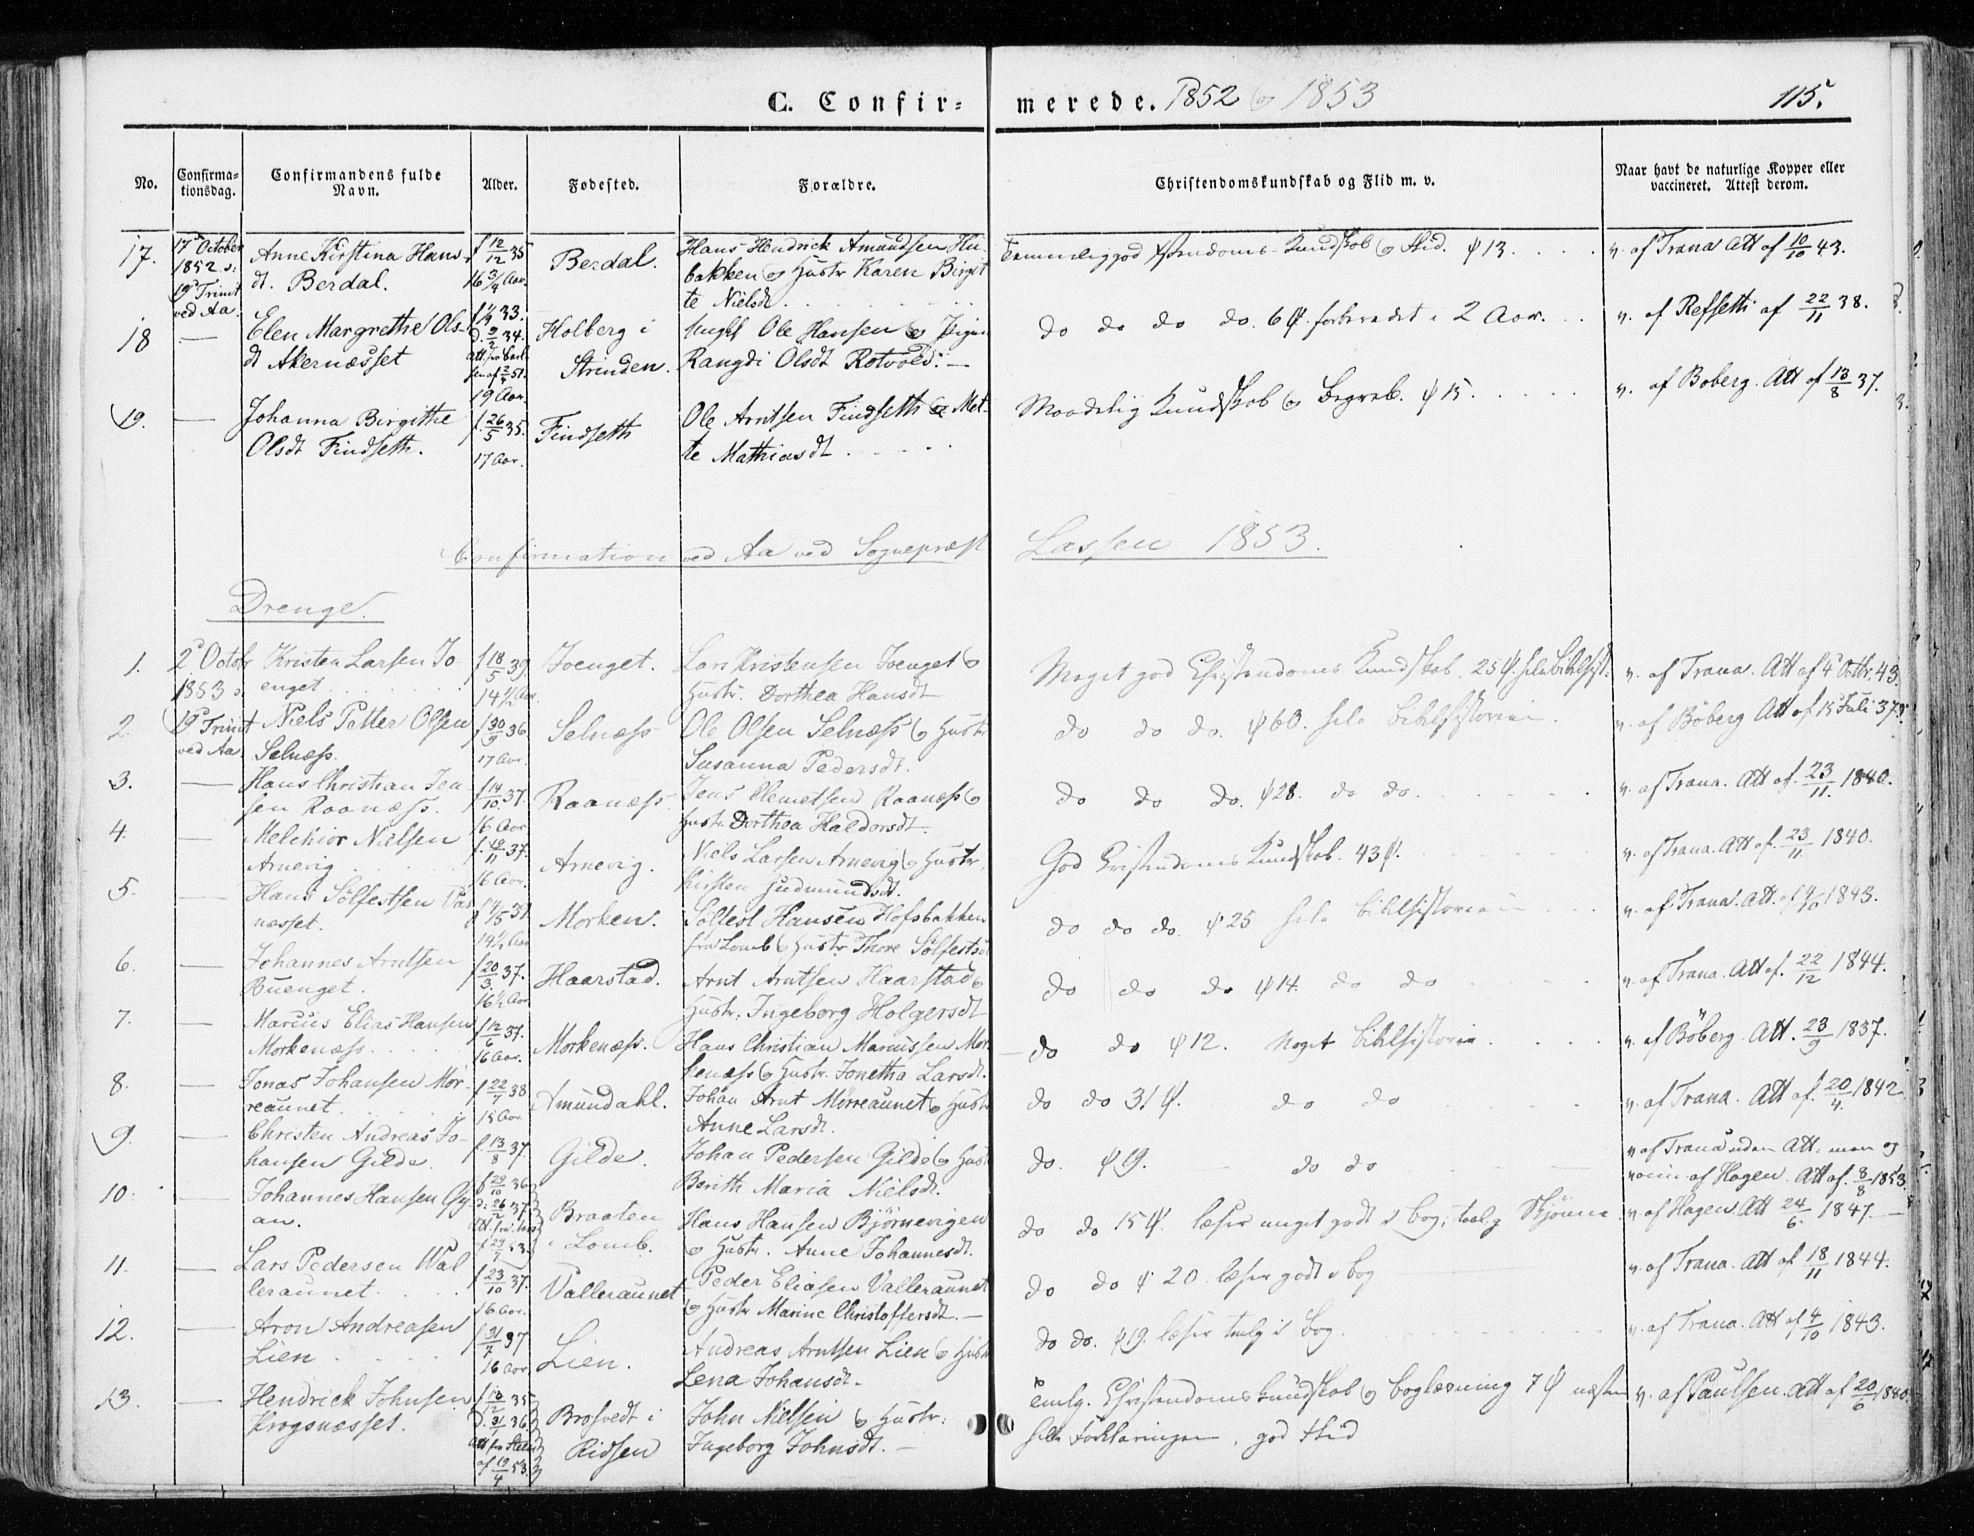 SAT, Ministerialprotokoller, klokkerbøker og fødselsregistre - Sør-Trøndelag, 655/L0677: Parish register (official) no. 655A06, 1847-1860, p. 115